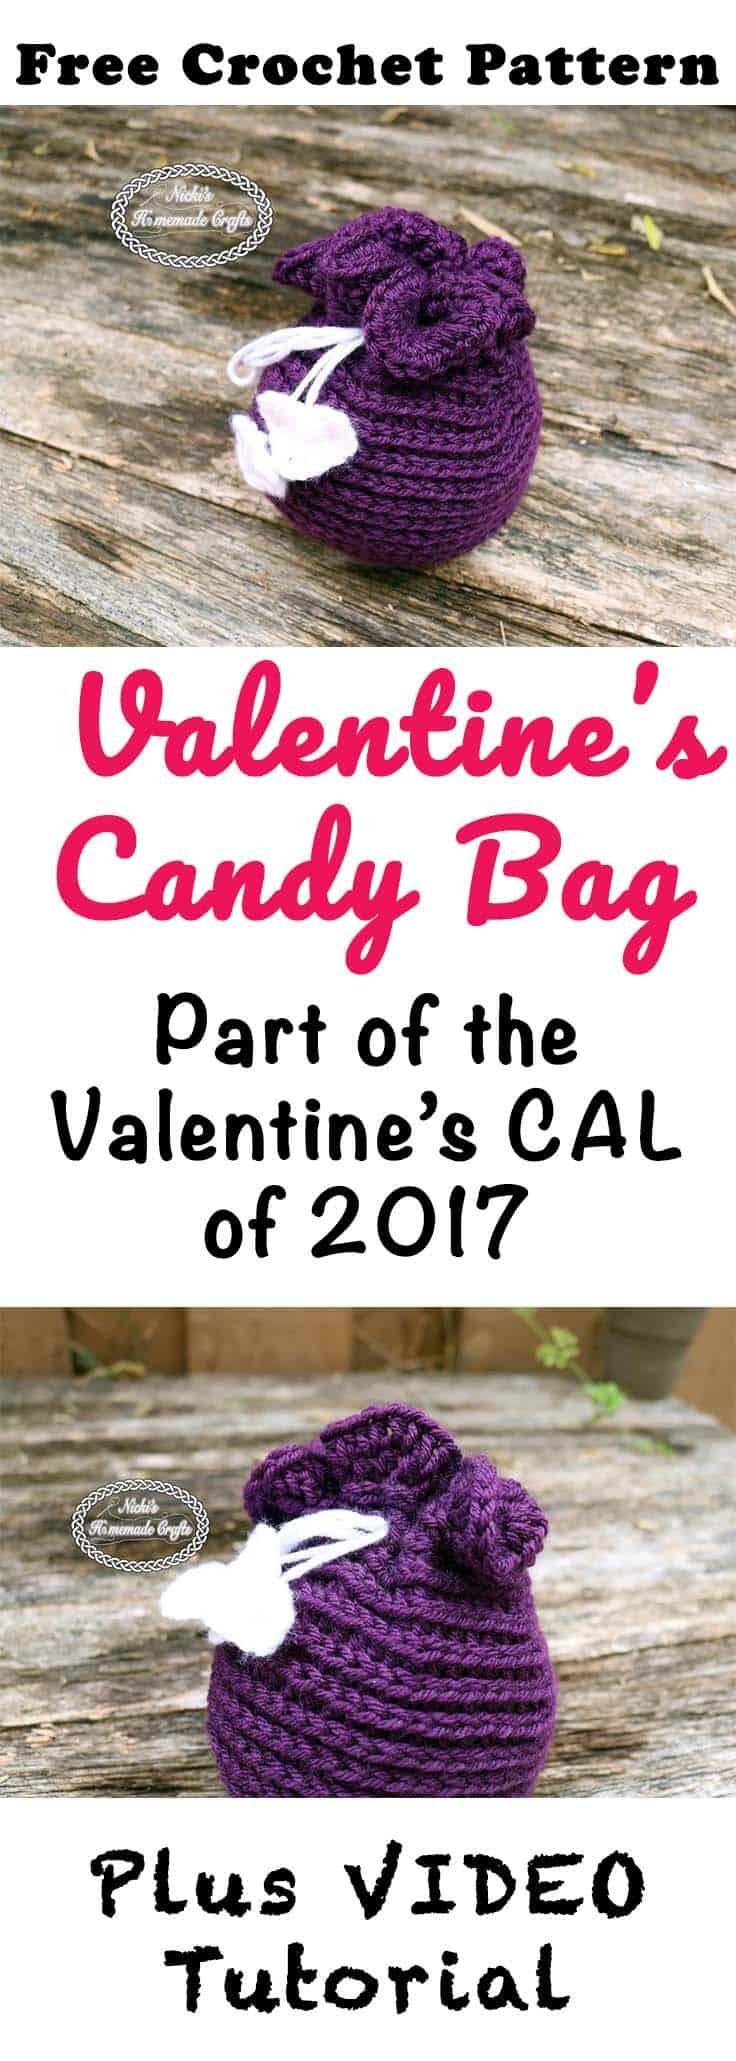 Valentine's Candy Bag - Free Crochet pattern by Nicki's Homemade Crafts #crochet #freecrochetpattern #valentinesday #candybag